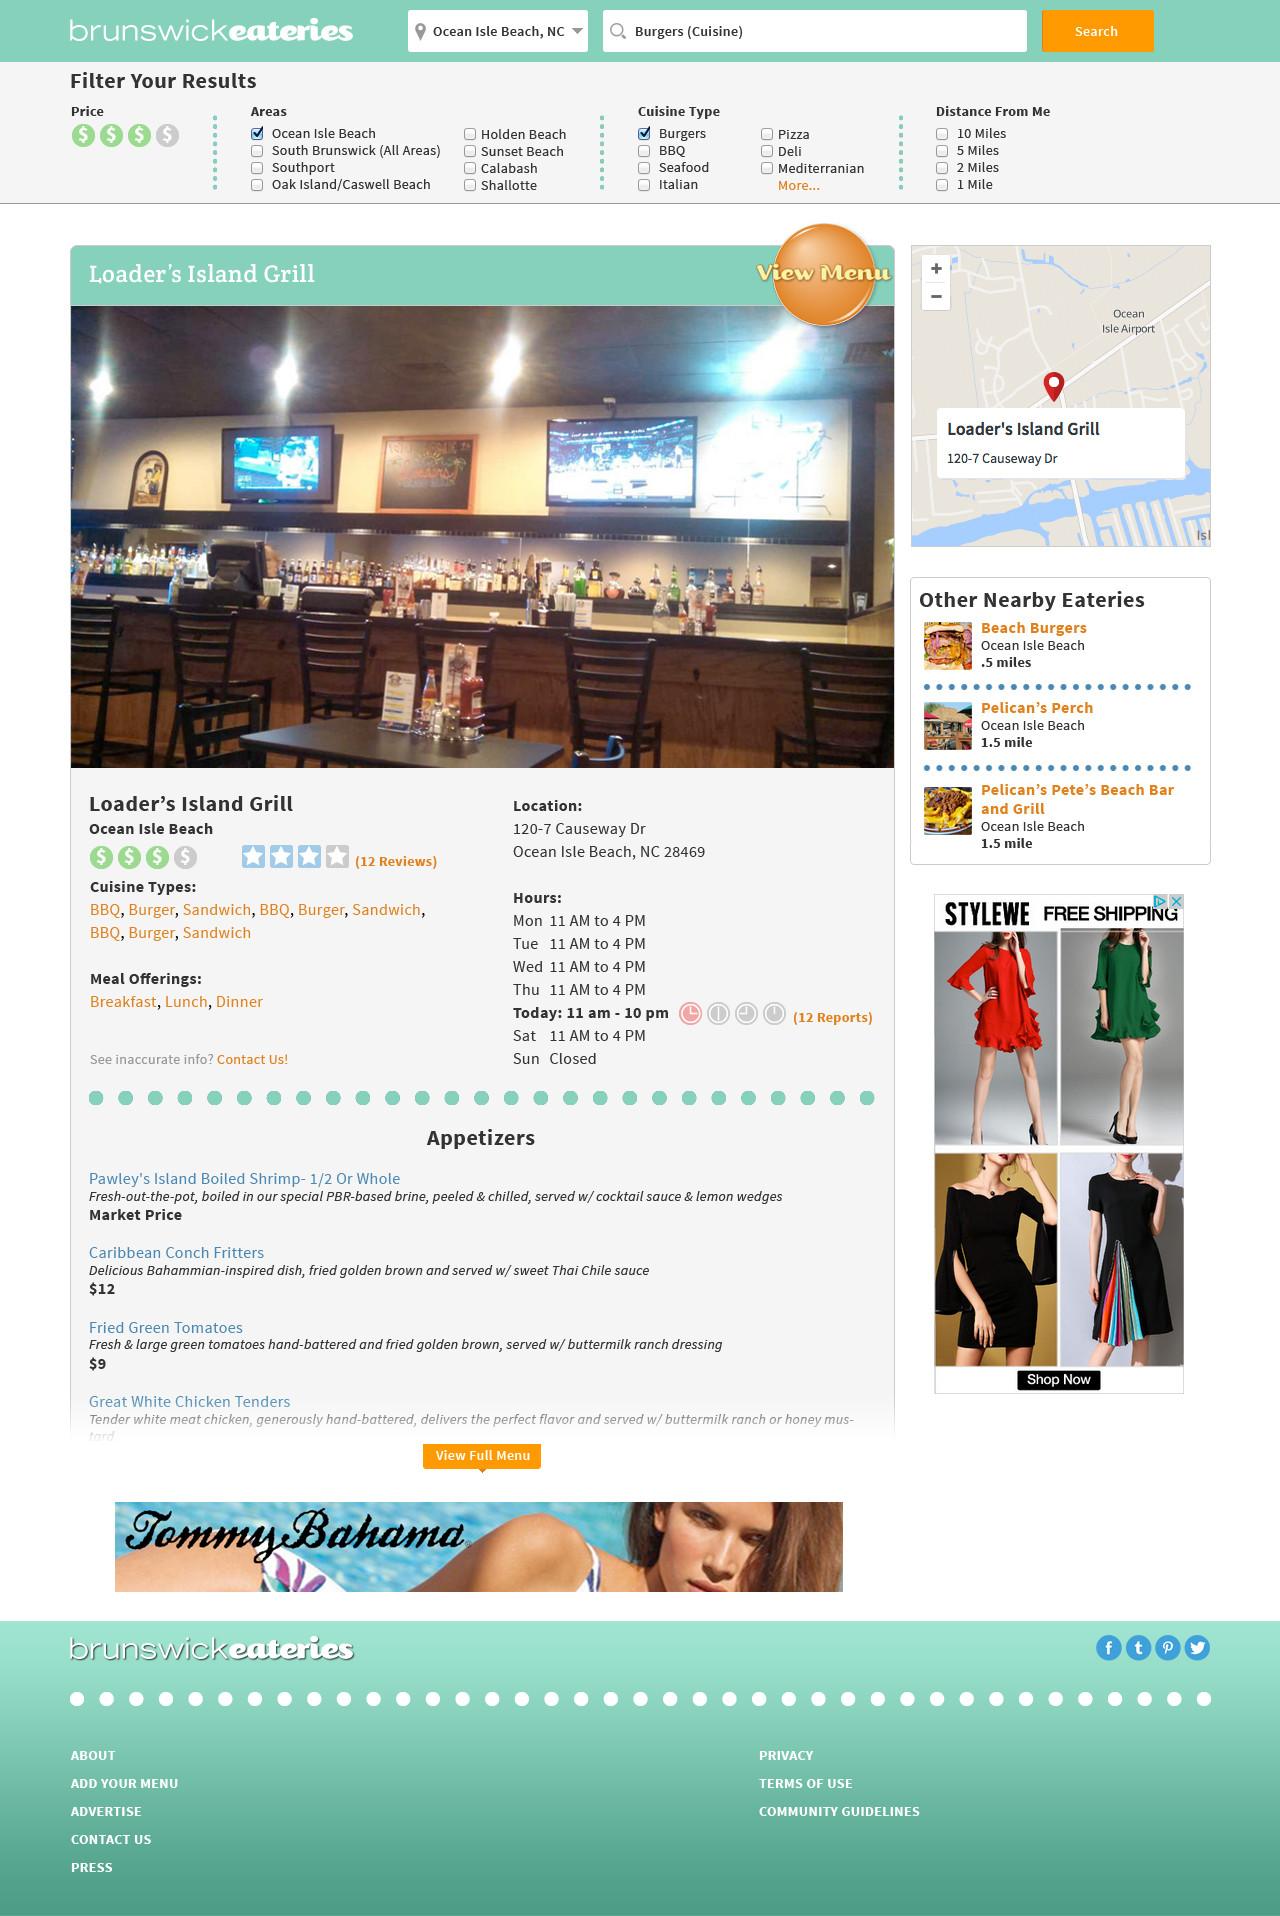 BrunswickEateries.com Restaurant Page